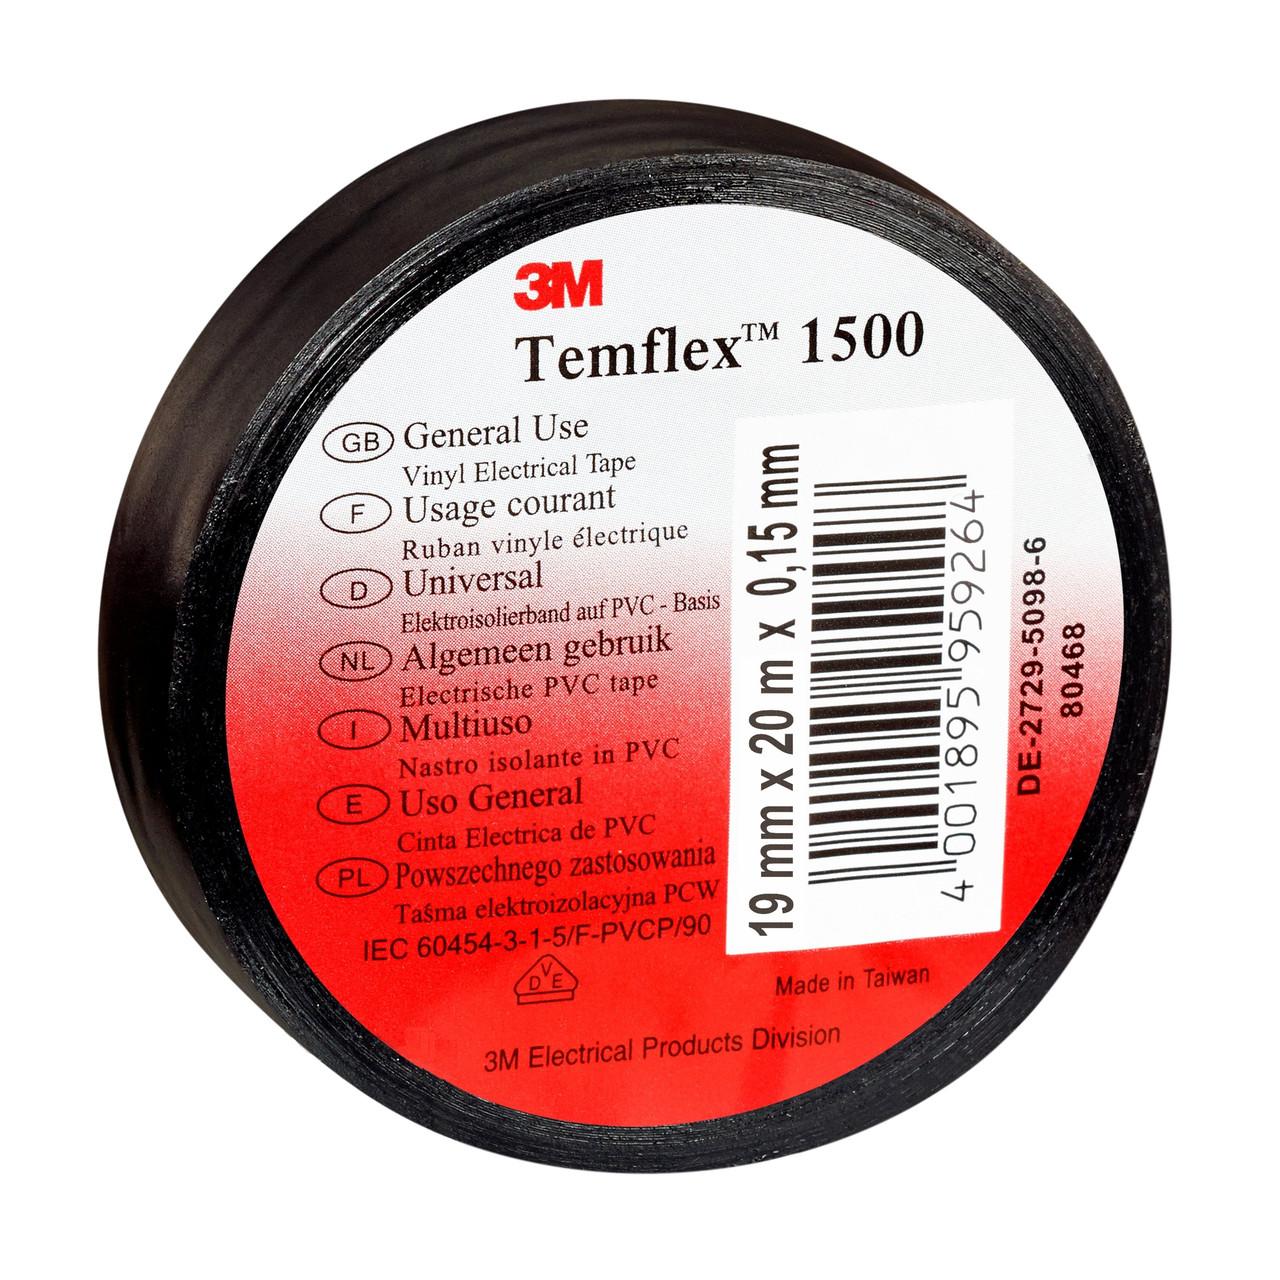 Изолента 3M Temflex™ 1500 ПВХ лента, черная, (19 мм x 20 м х 0,15 мм)